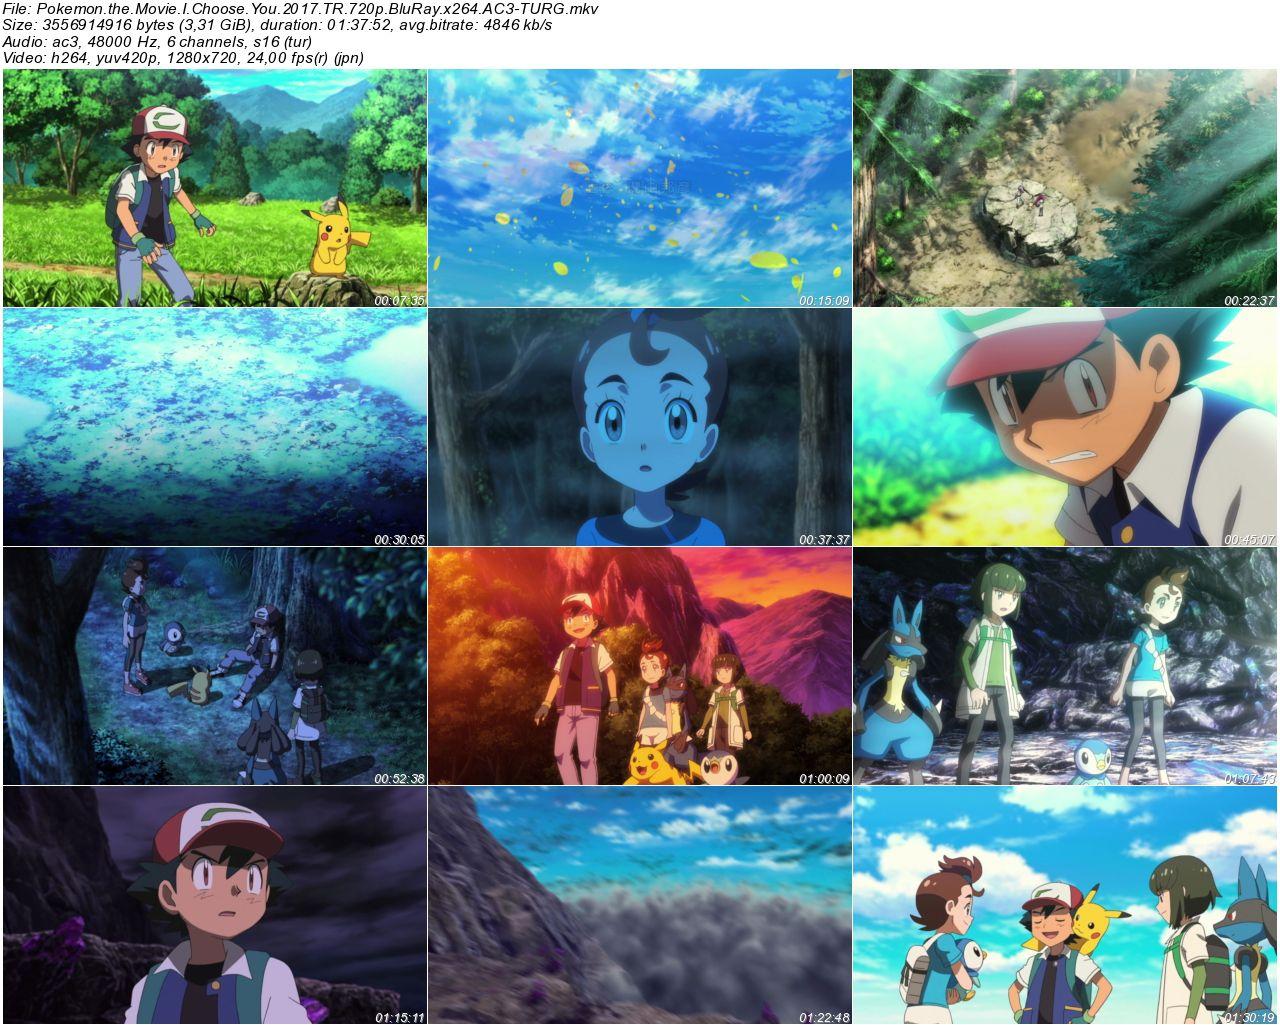 Pokemon the Movie I Choose You 2017 - 1080p 720p 480p - Türkçe Dublaj Tek Link indir